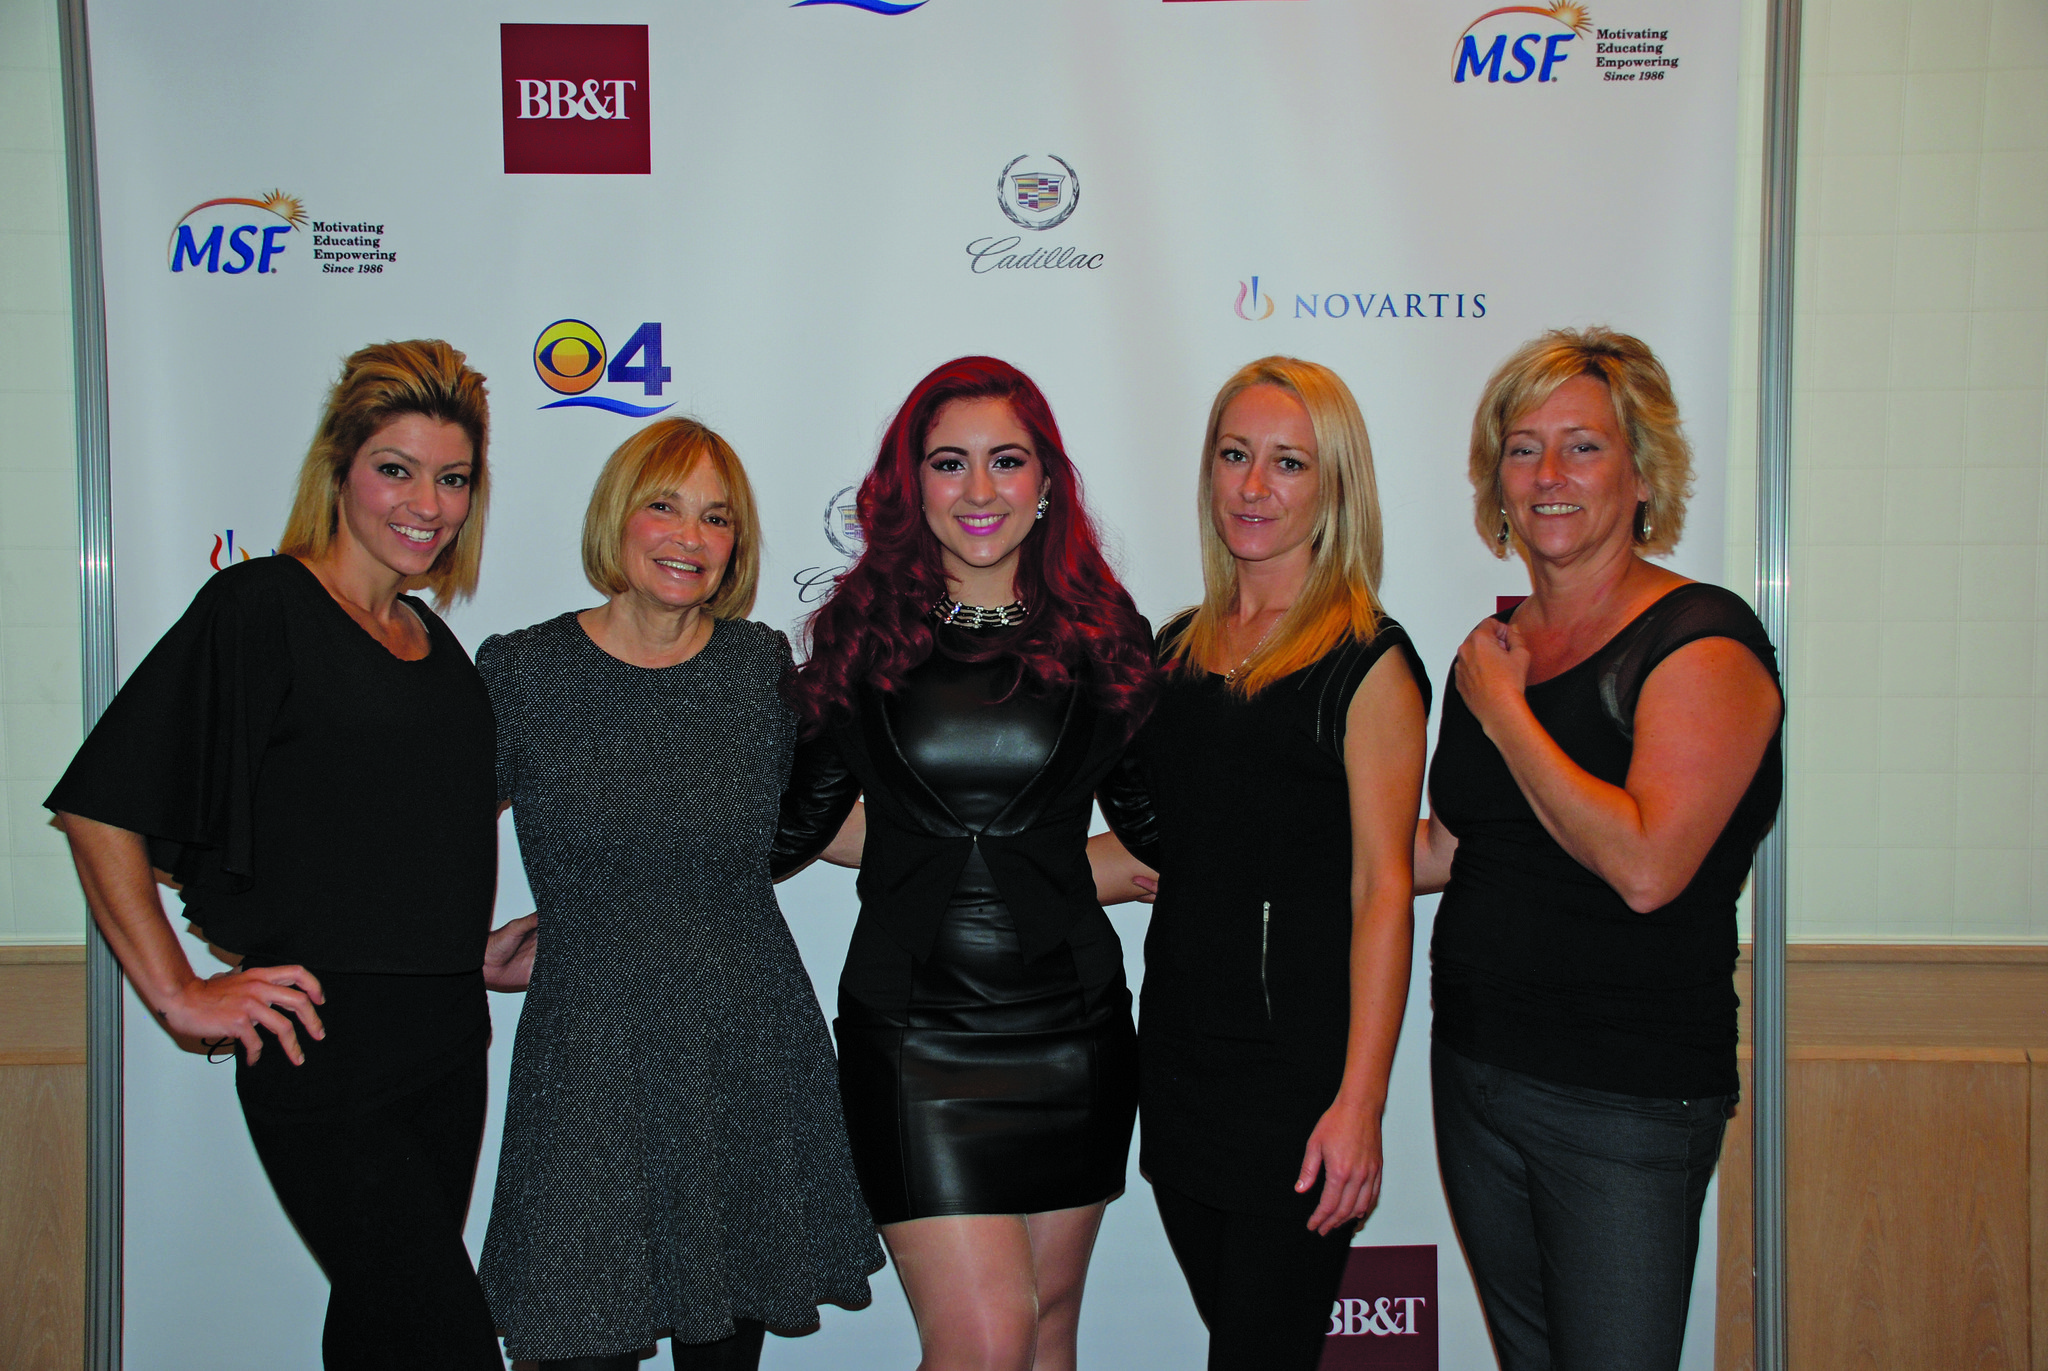 Society Scene photos - Diana Abelha, left, Perrie Gurfein, Monique Abbadie, Marta Wilczynski and Barbara Johnson supported the Multiple Sclerosis Foundation